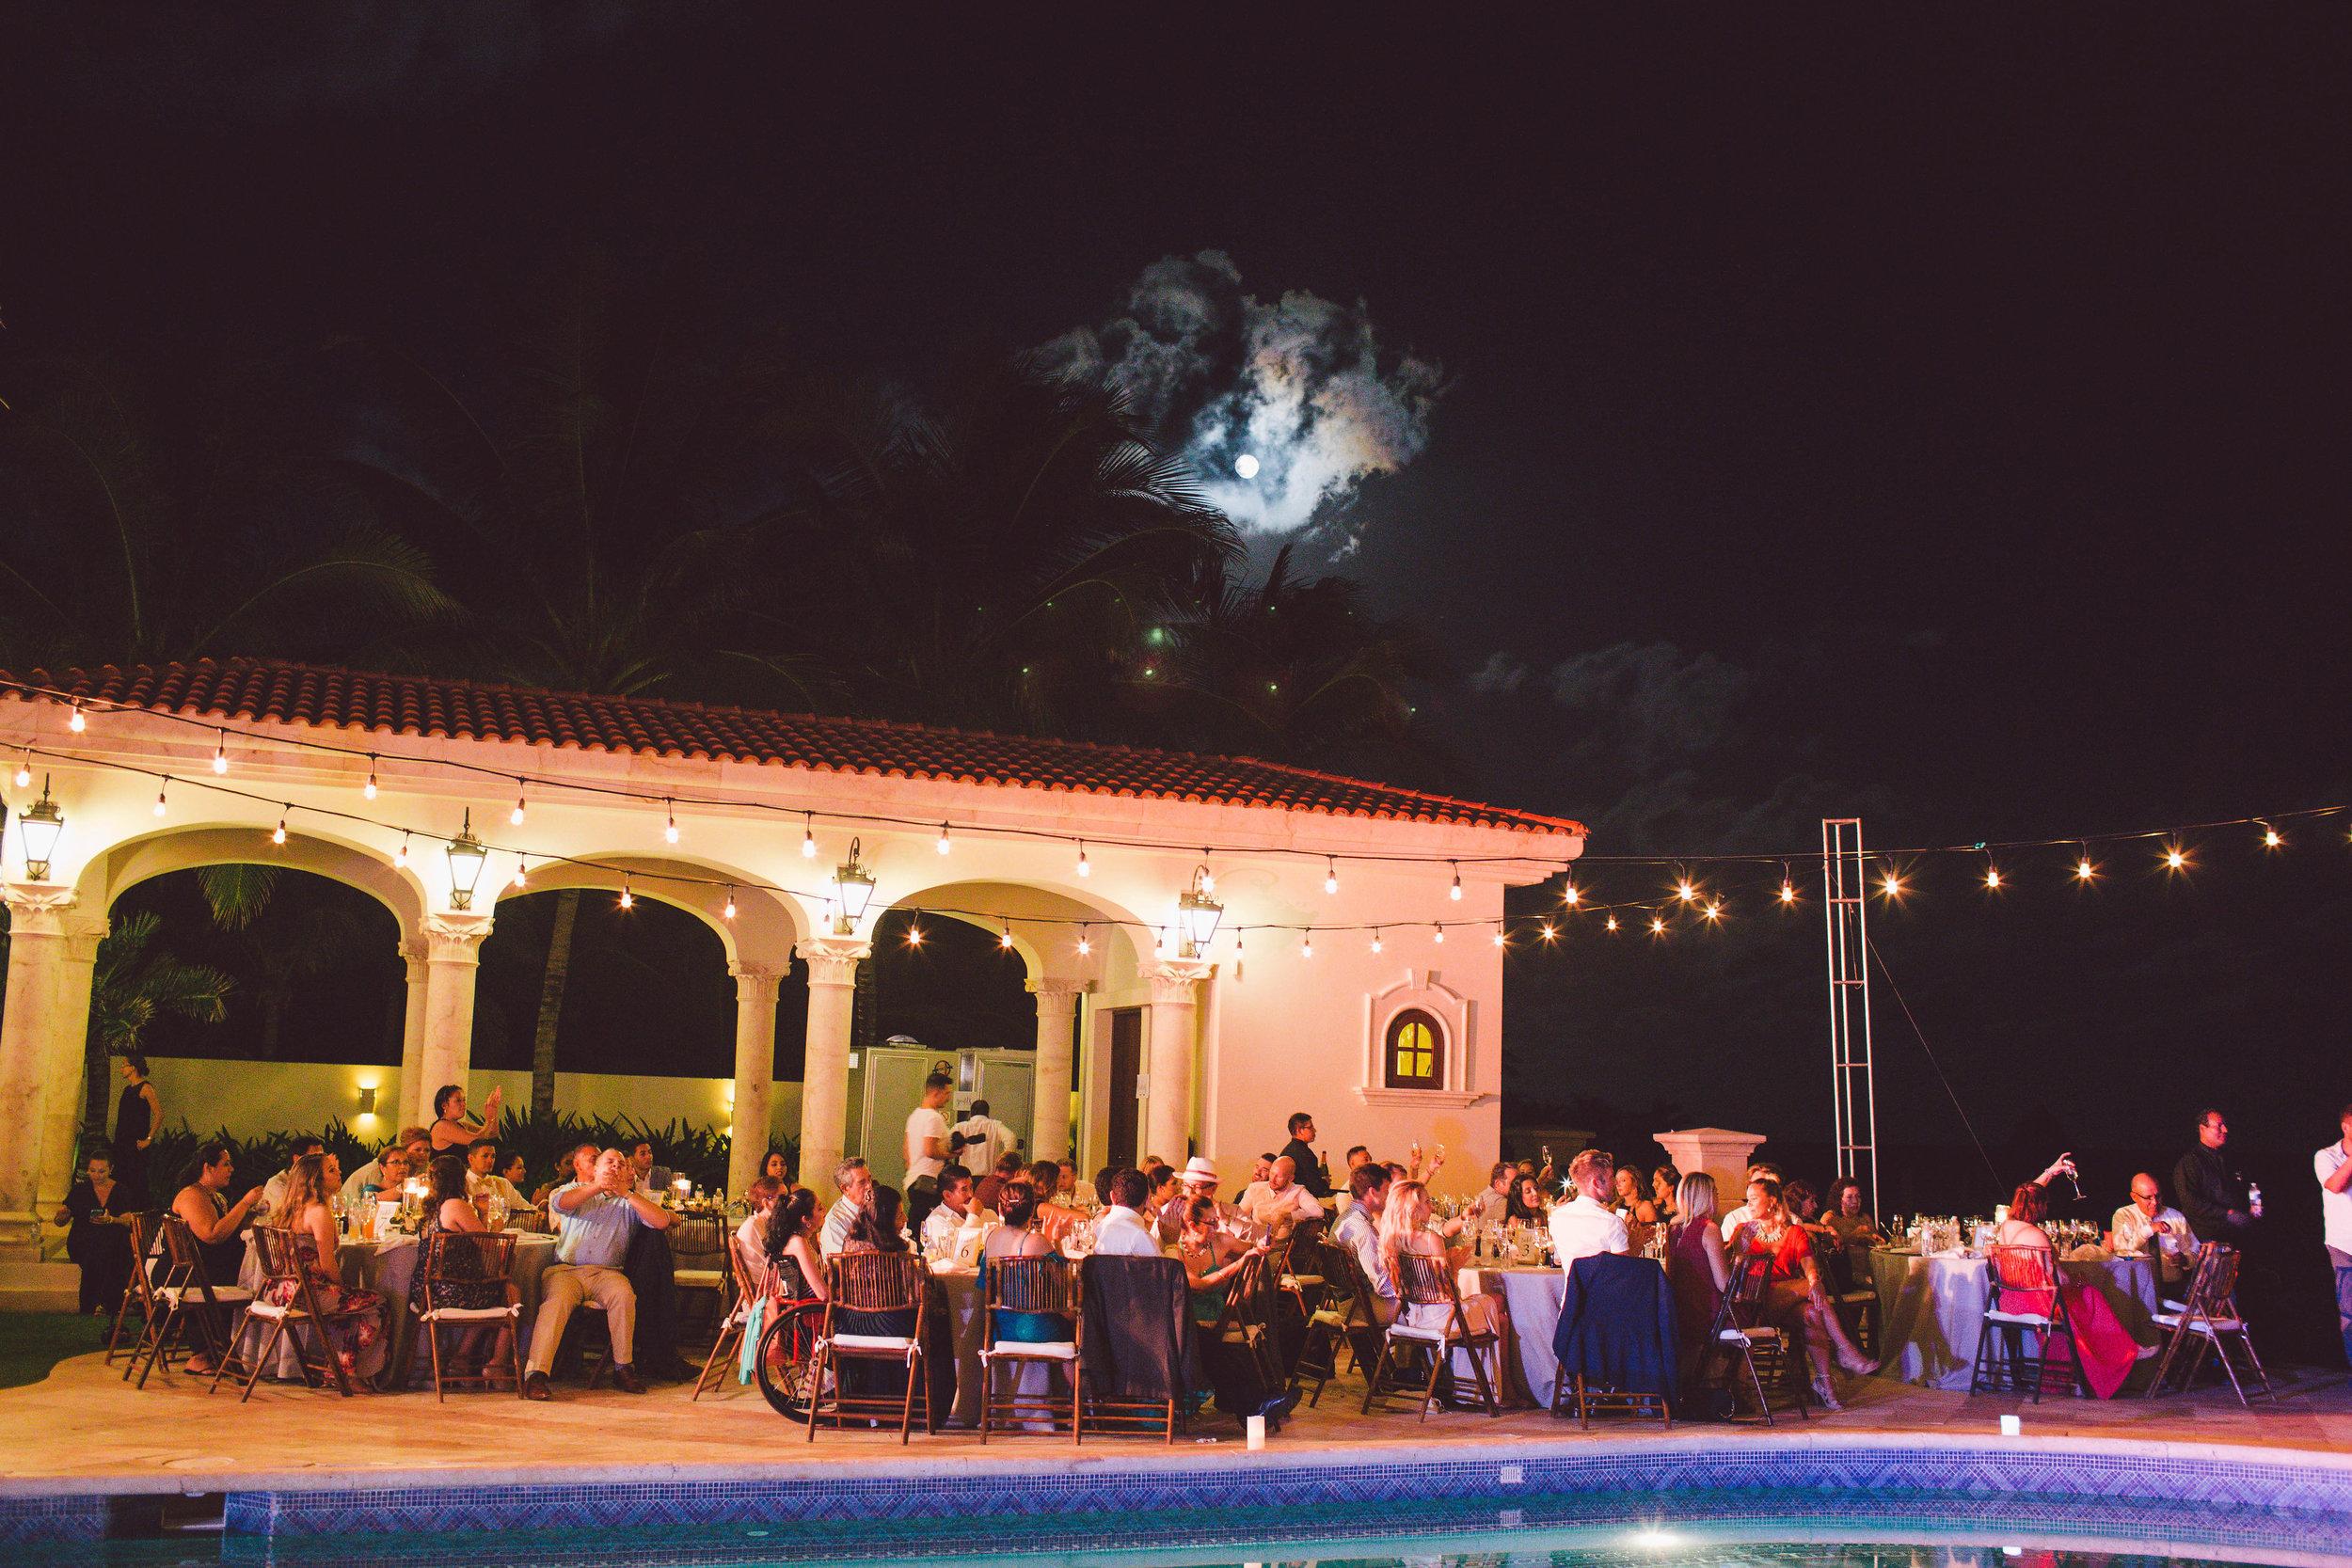 mexico_wedding_cancun_villa_la_joya_evangeline_lane_139.jpg